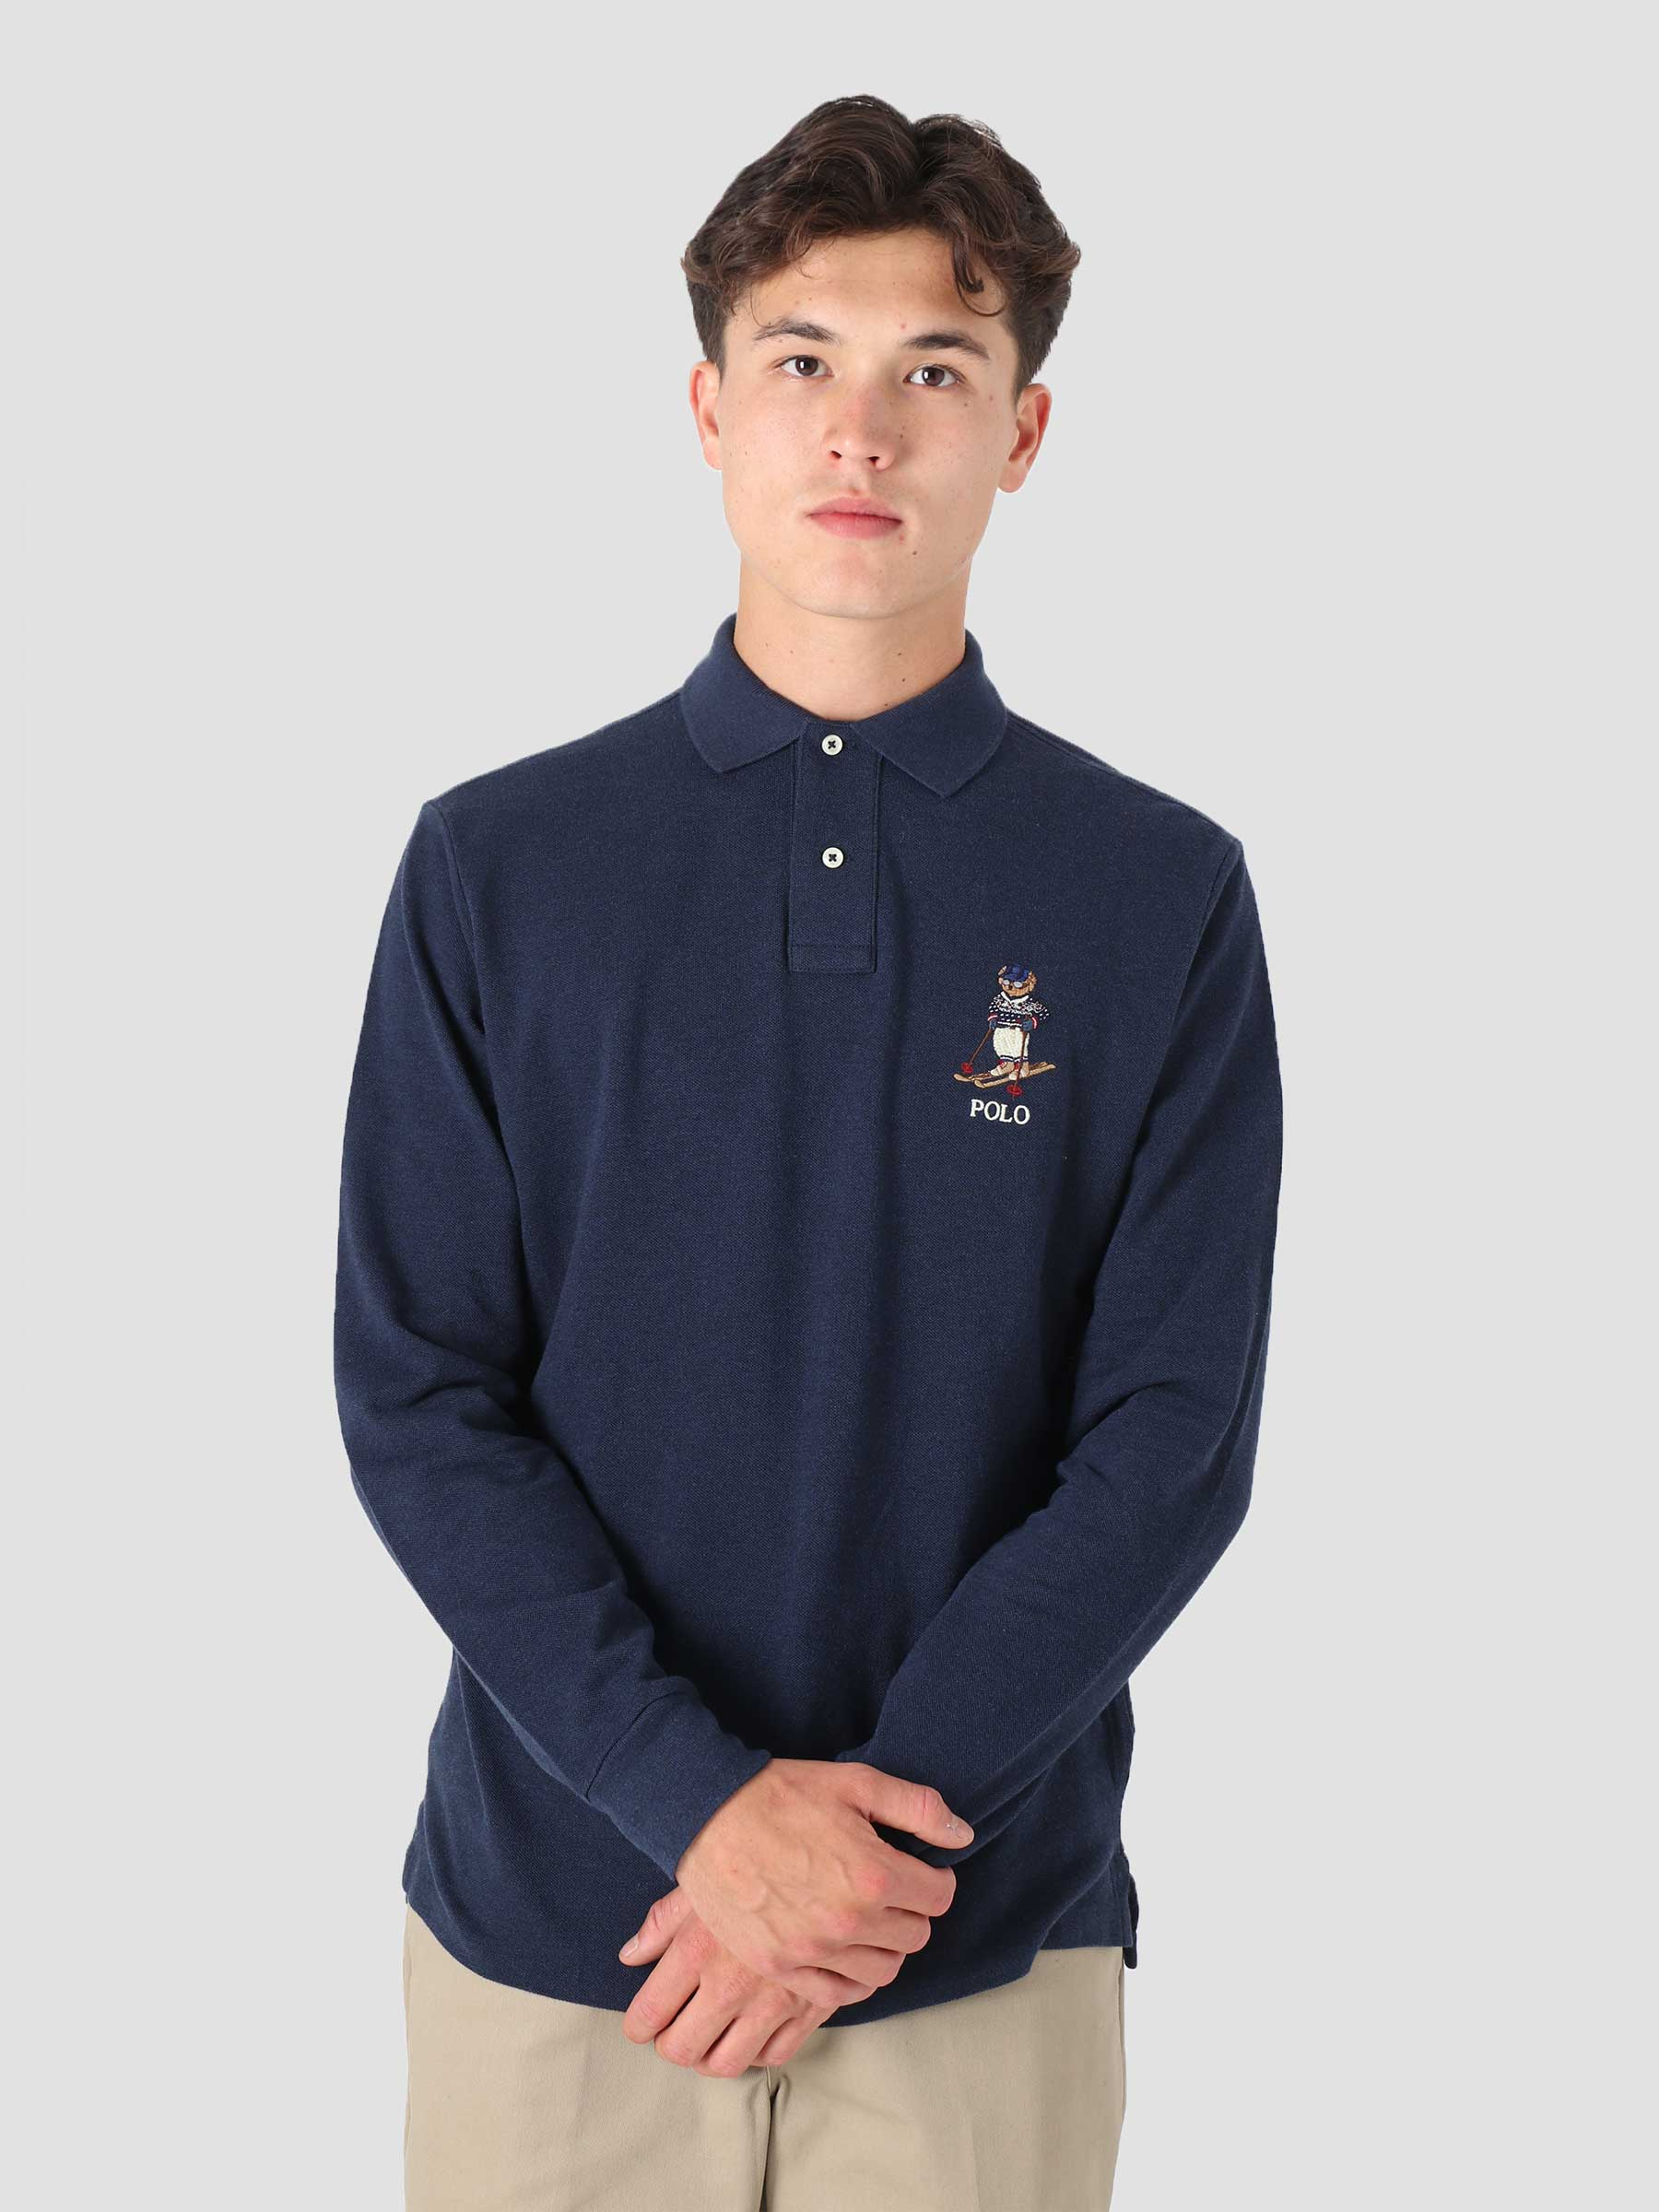 20-1 Mesh Long Sleeve Polo Shirt Medieval Blue Heather 710853322001